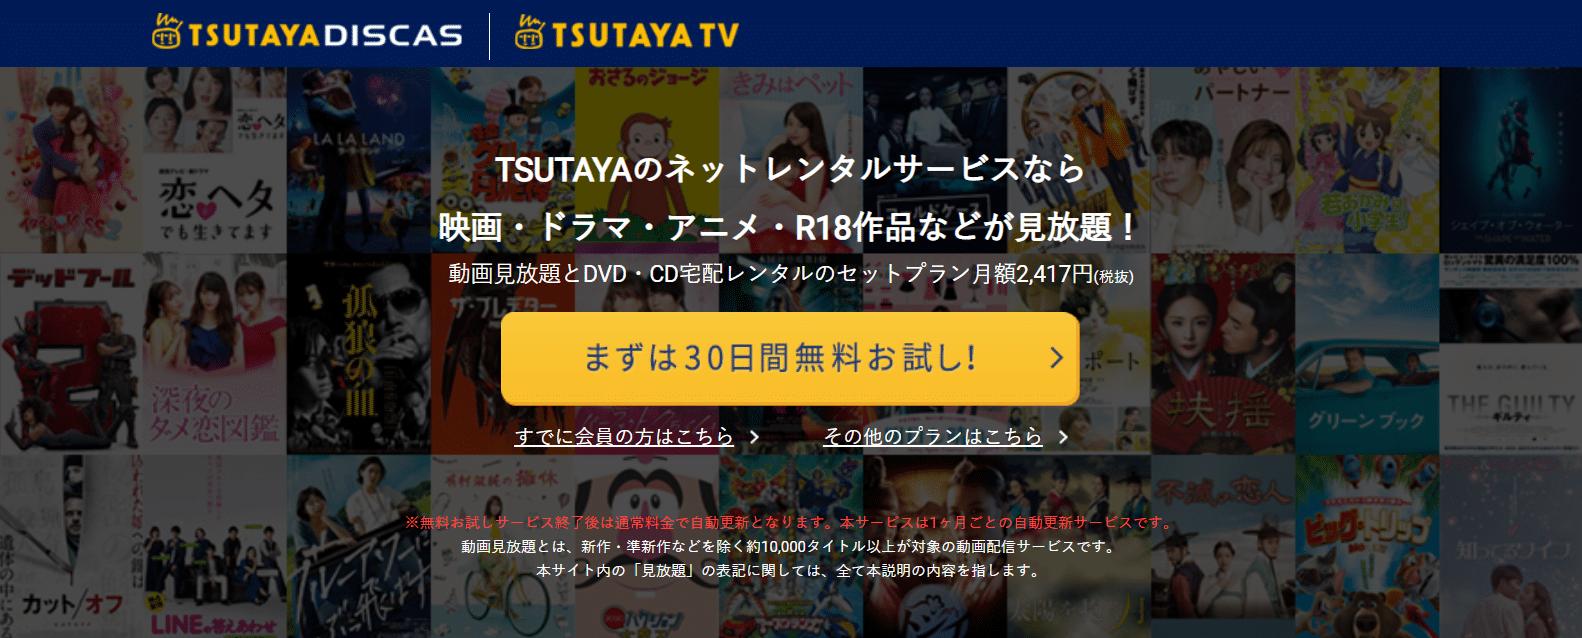 tsutaya_tv